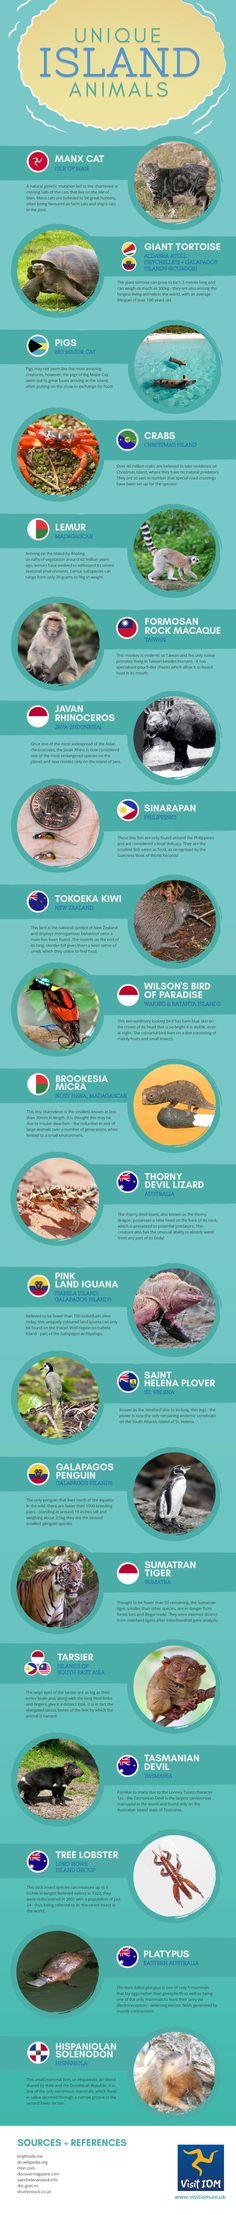 Unique Island Animals #Infographic #Animal